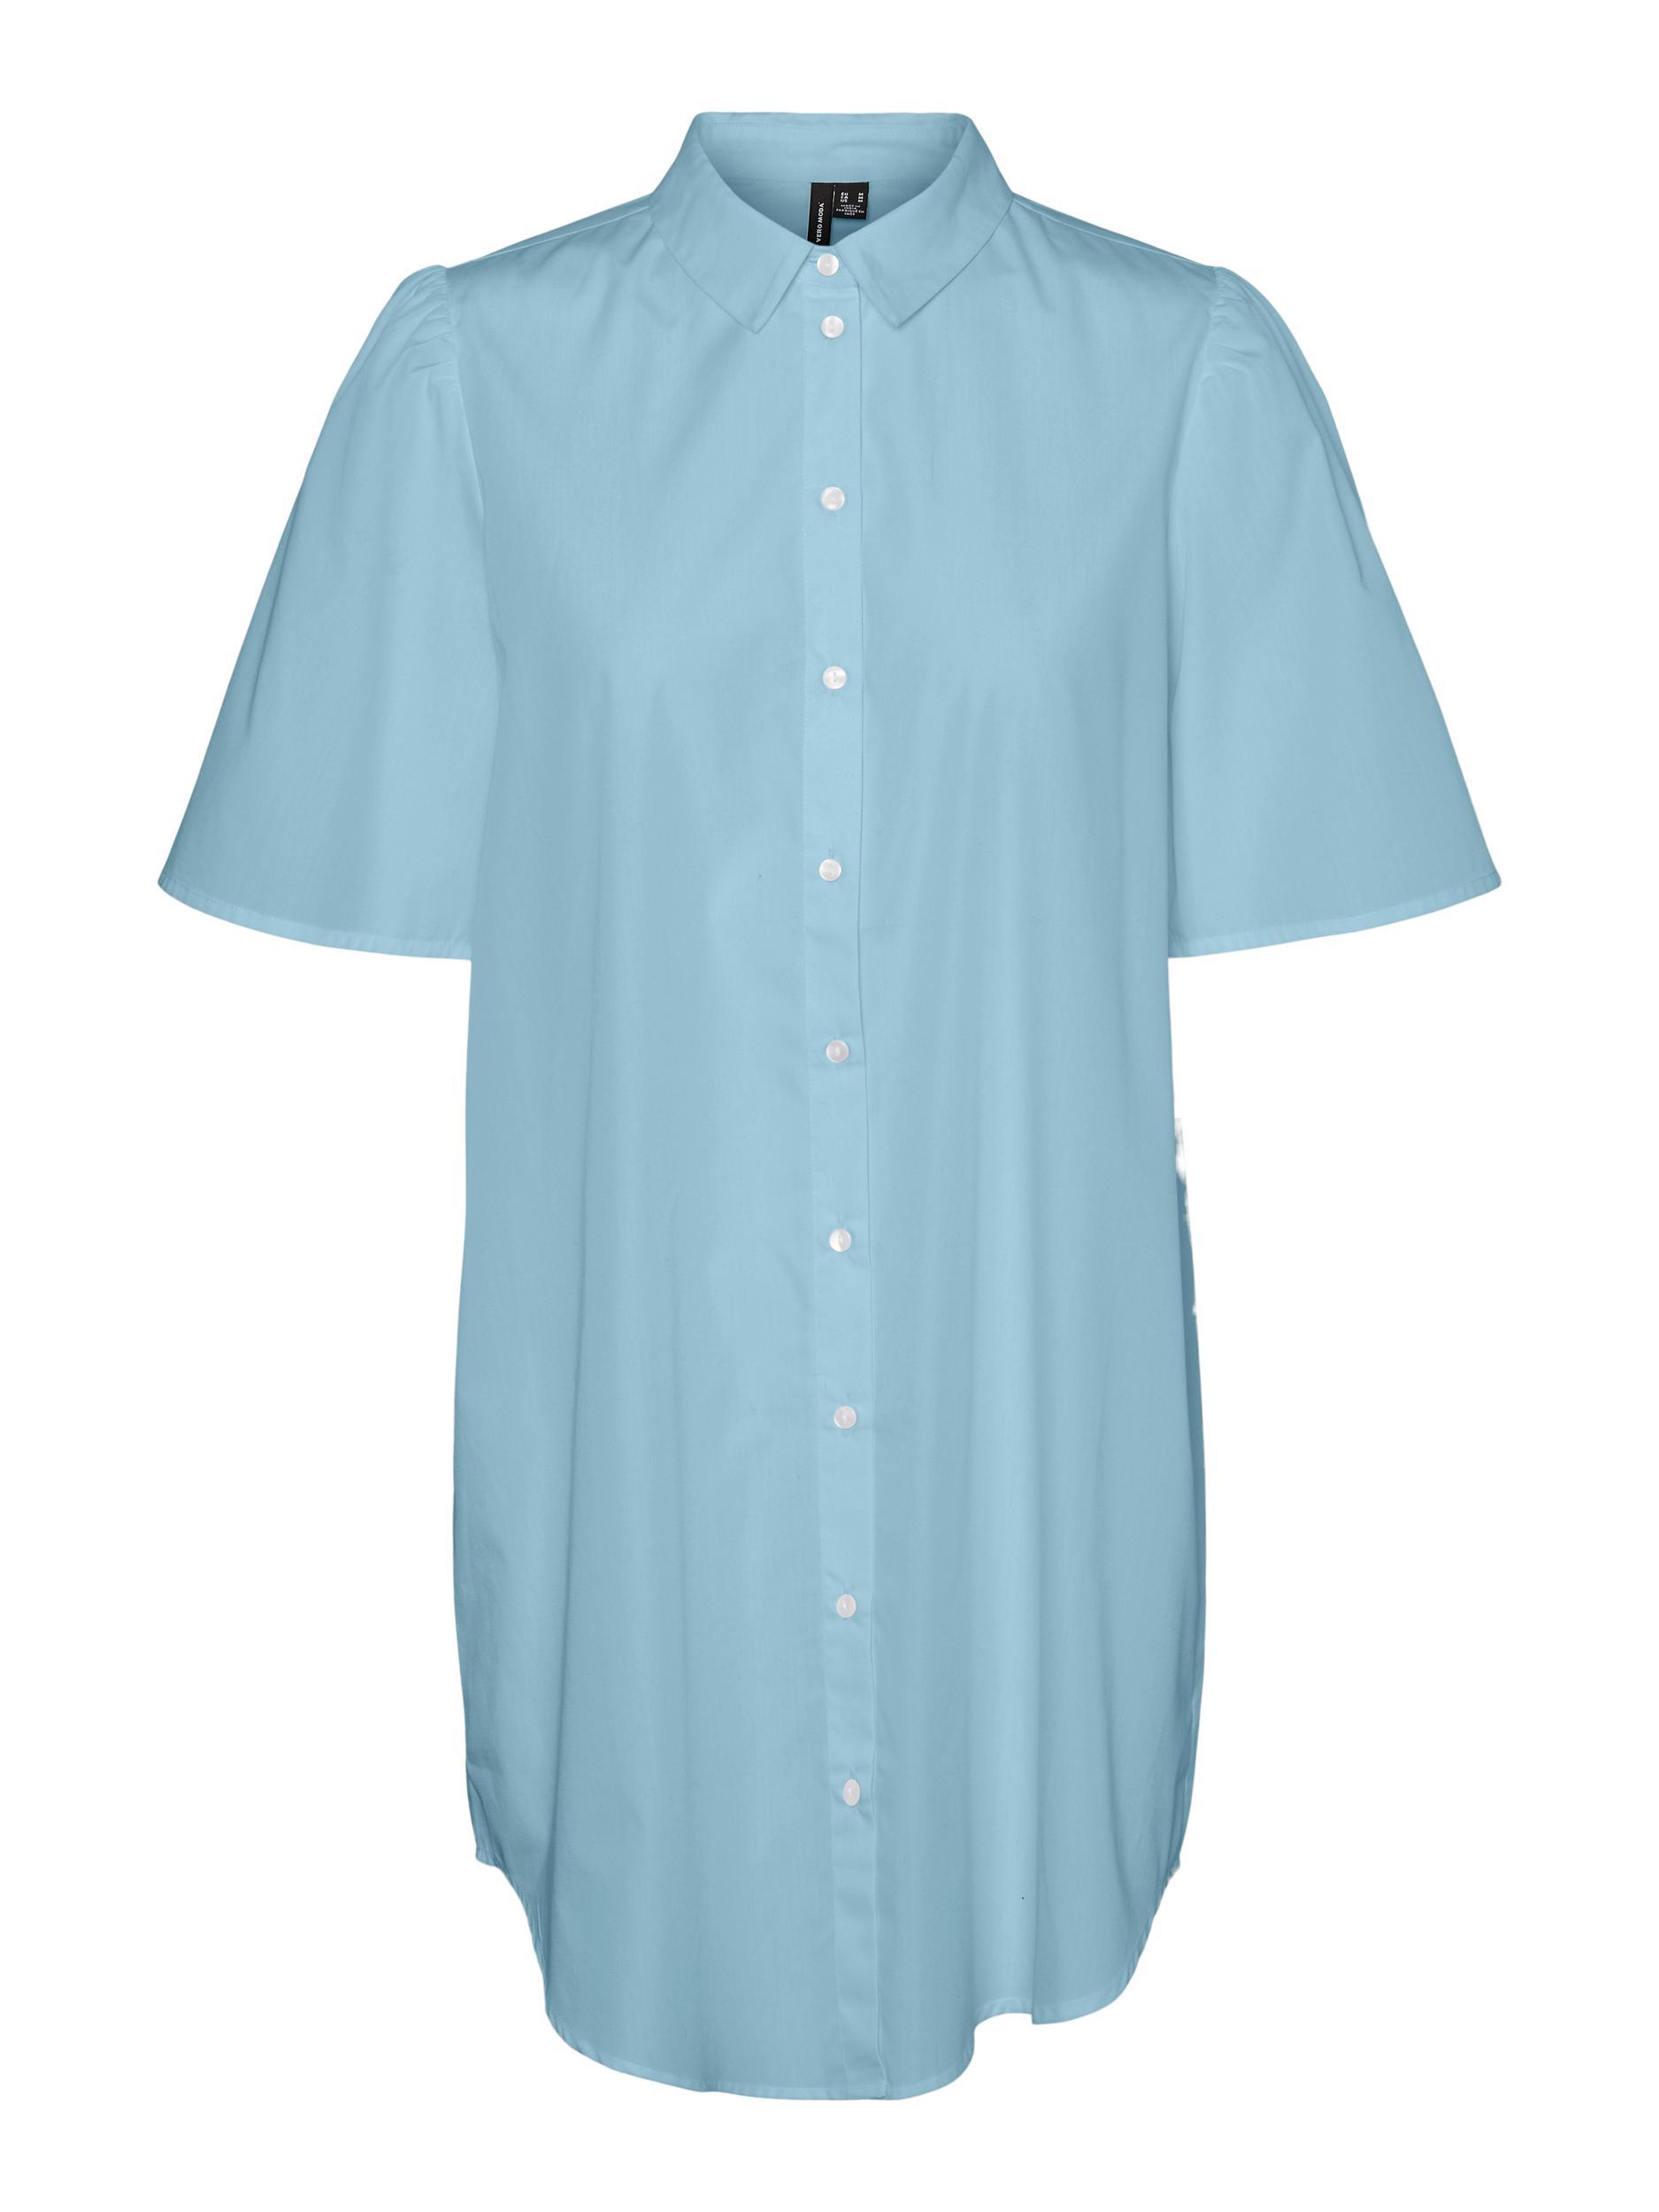 Vero Moda Hella skjorte, aqua, large